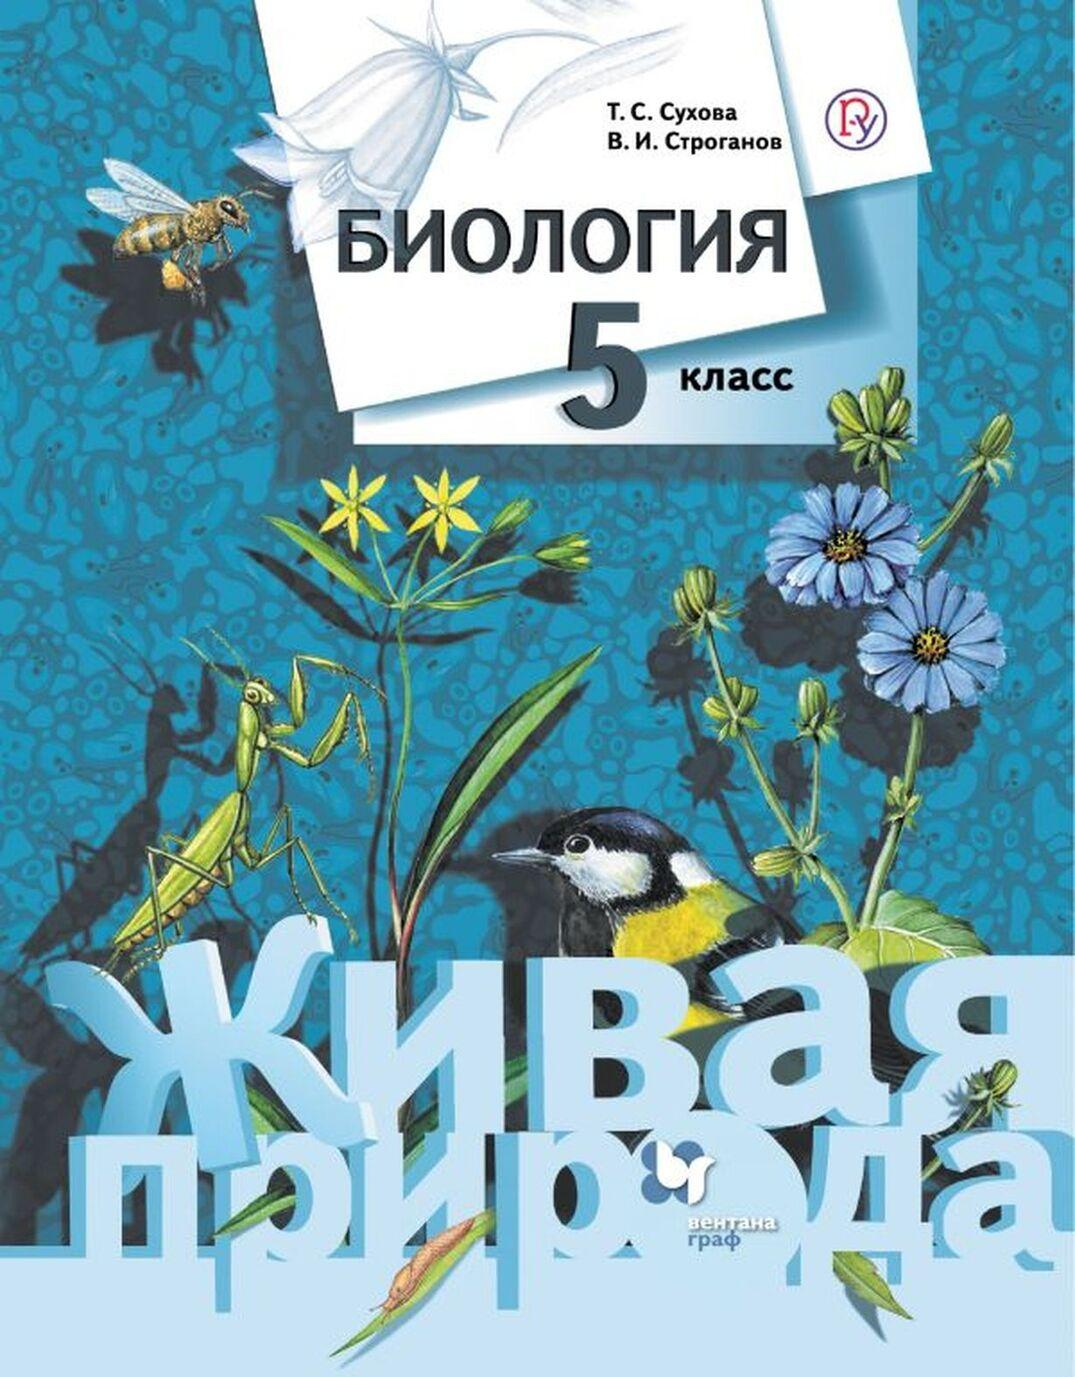 Biologija. 5klass. Uchebnik | Sukhova Tamara Sergeevna, Stroganov Vladimir Ivanovich